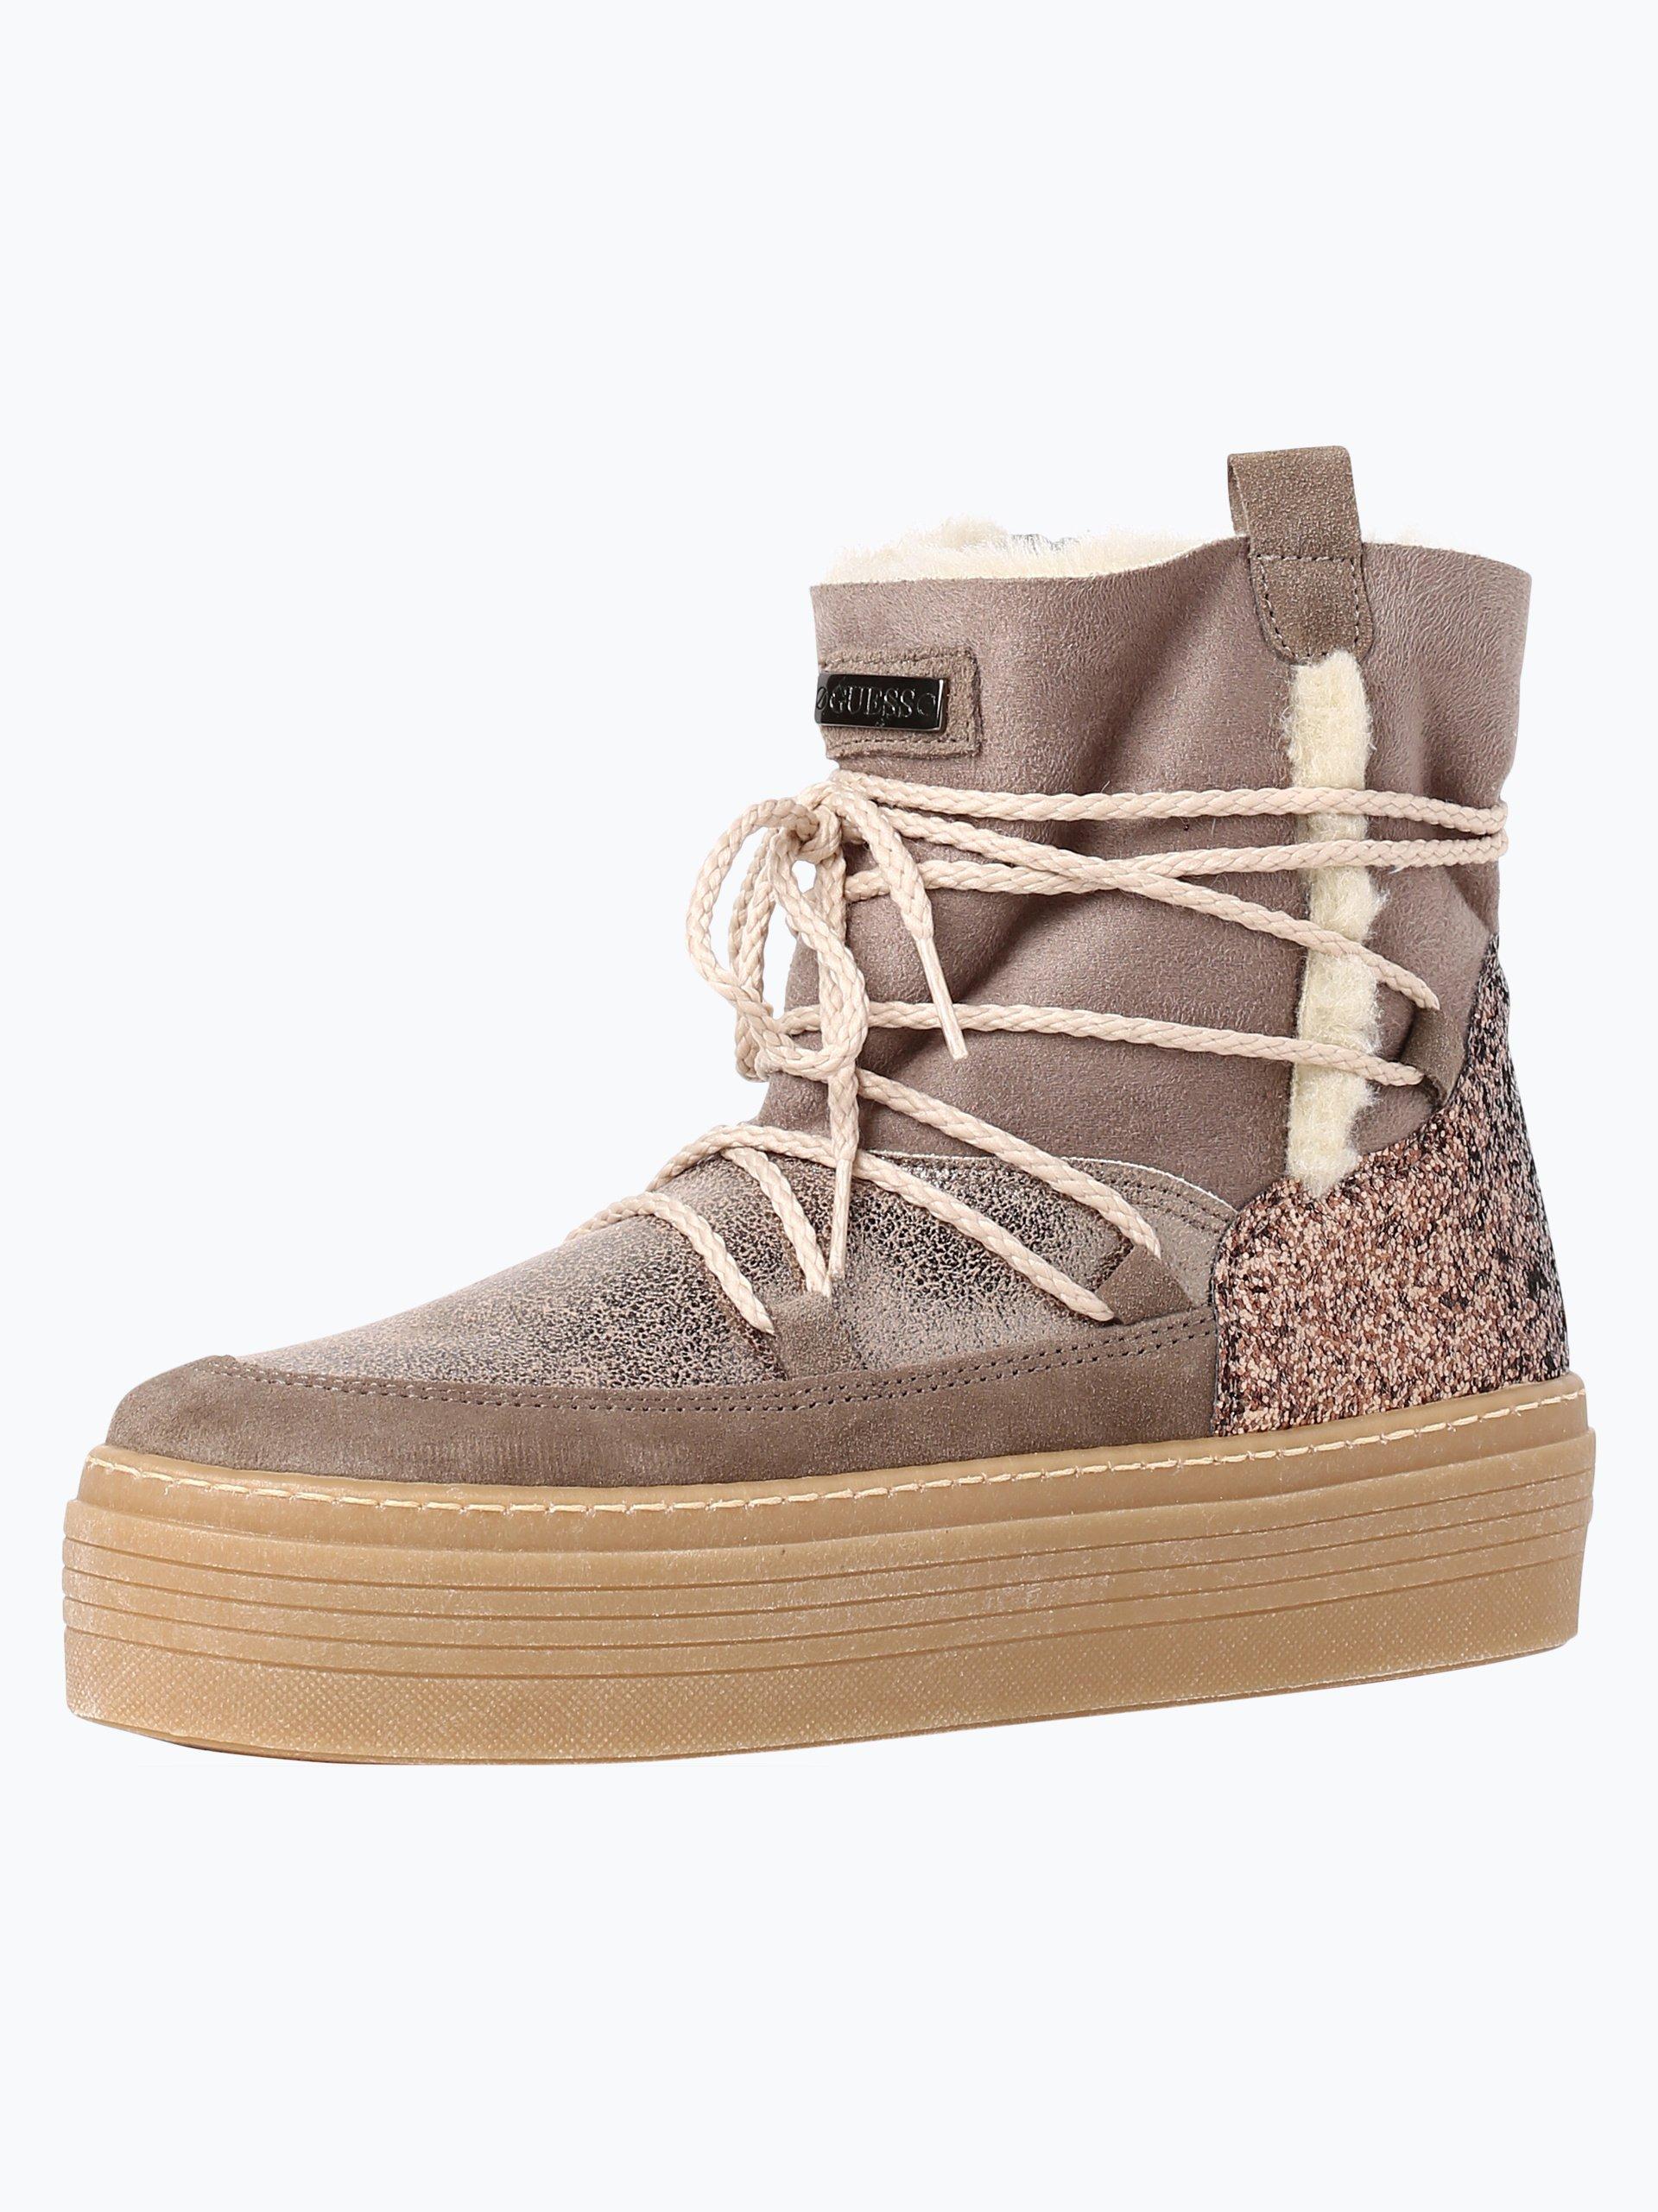 Guess Jeans Damen Boots